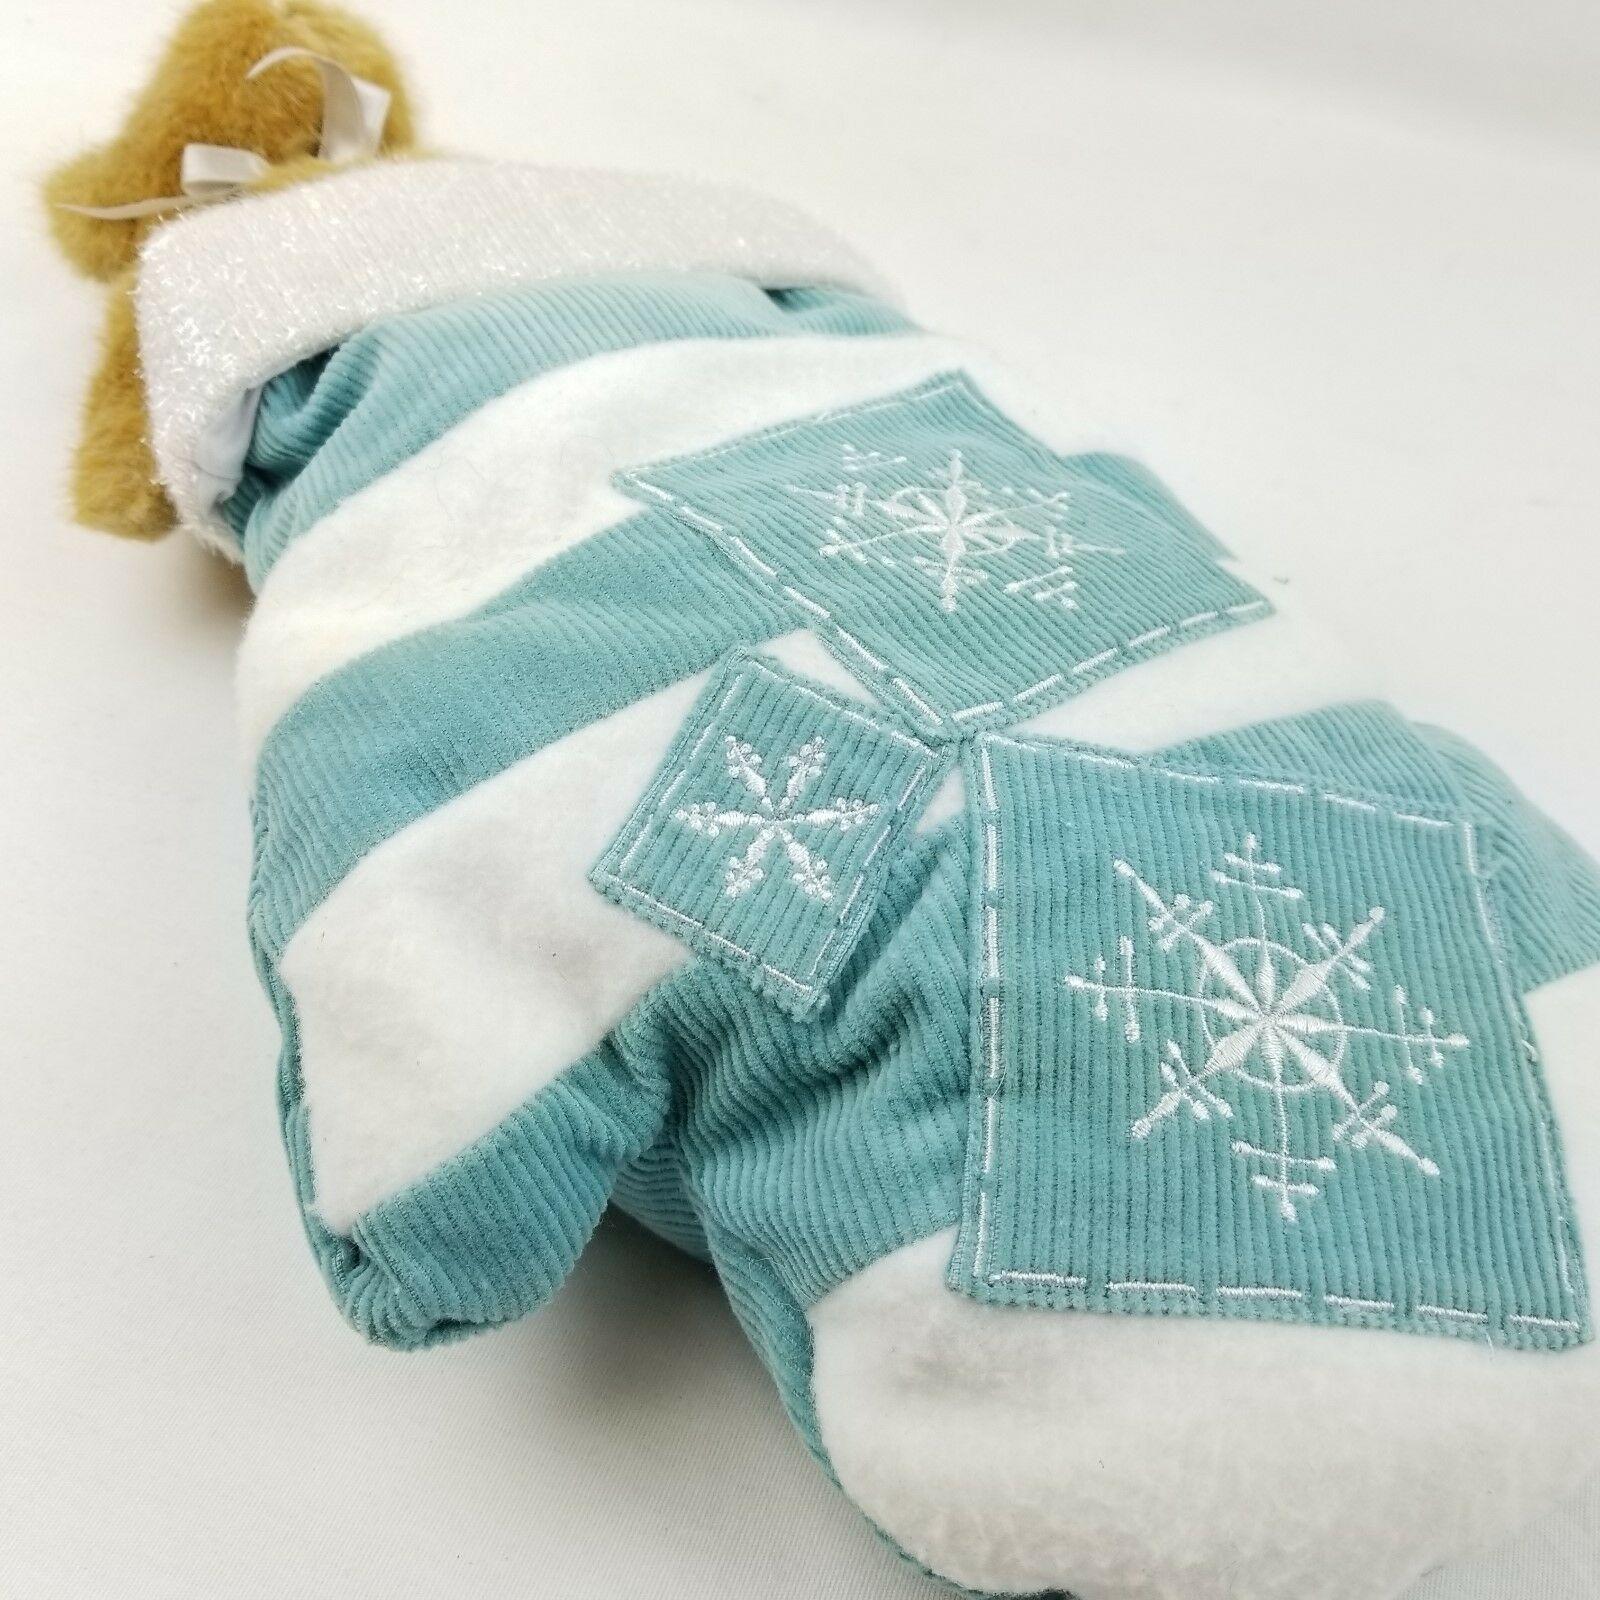 Boyds Teddy Bear In Mitten Glove Christmas Stocking Snowflakes Fallin White Teal